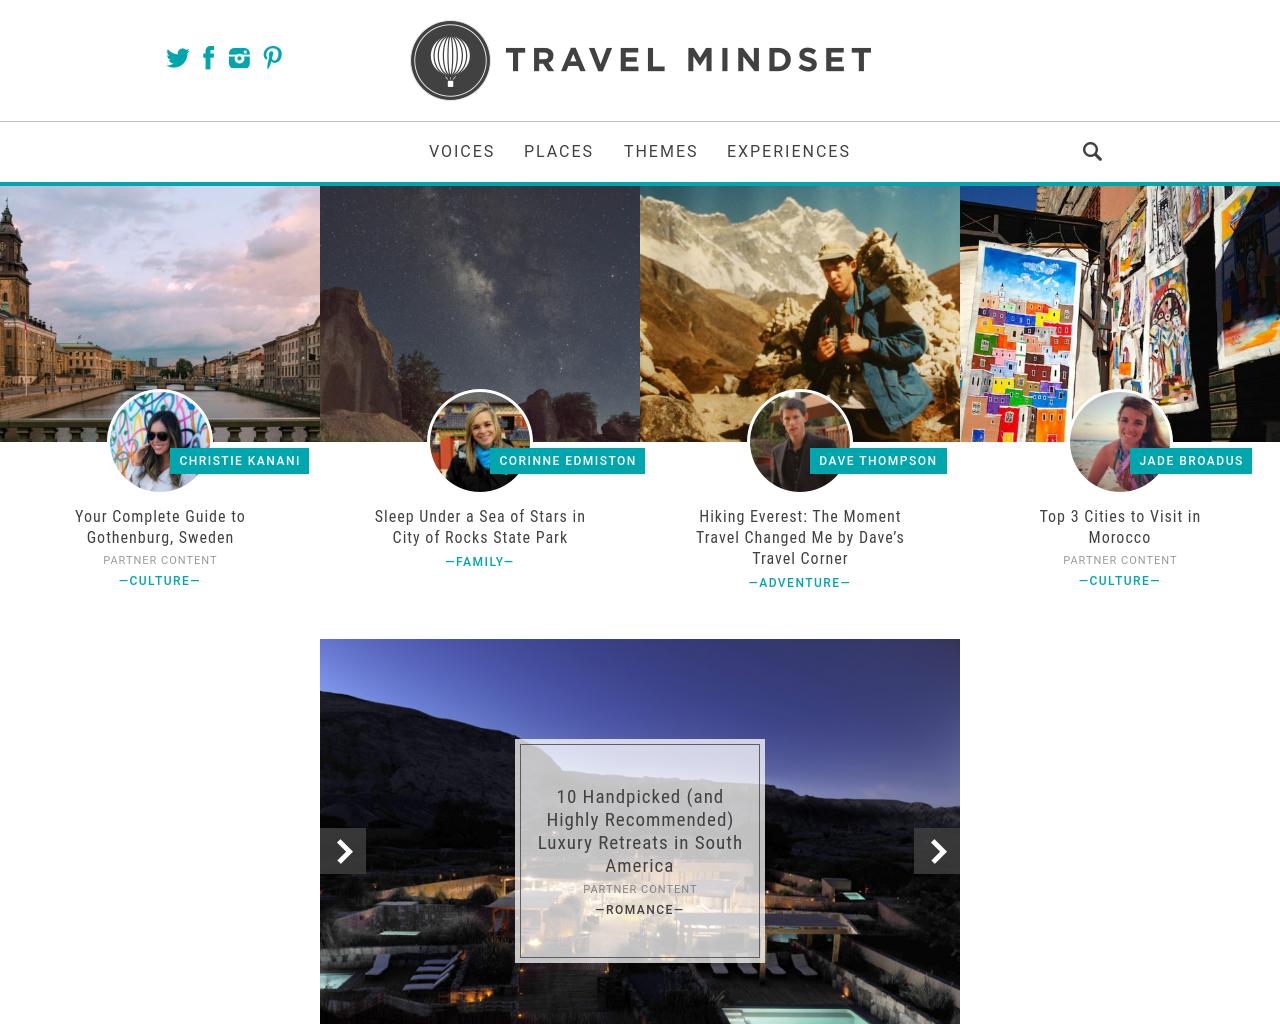 Travel-Mindset-Advertising-Reviews-Pricing